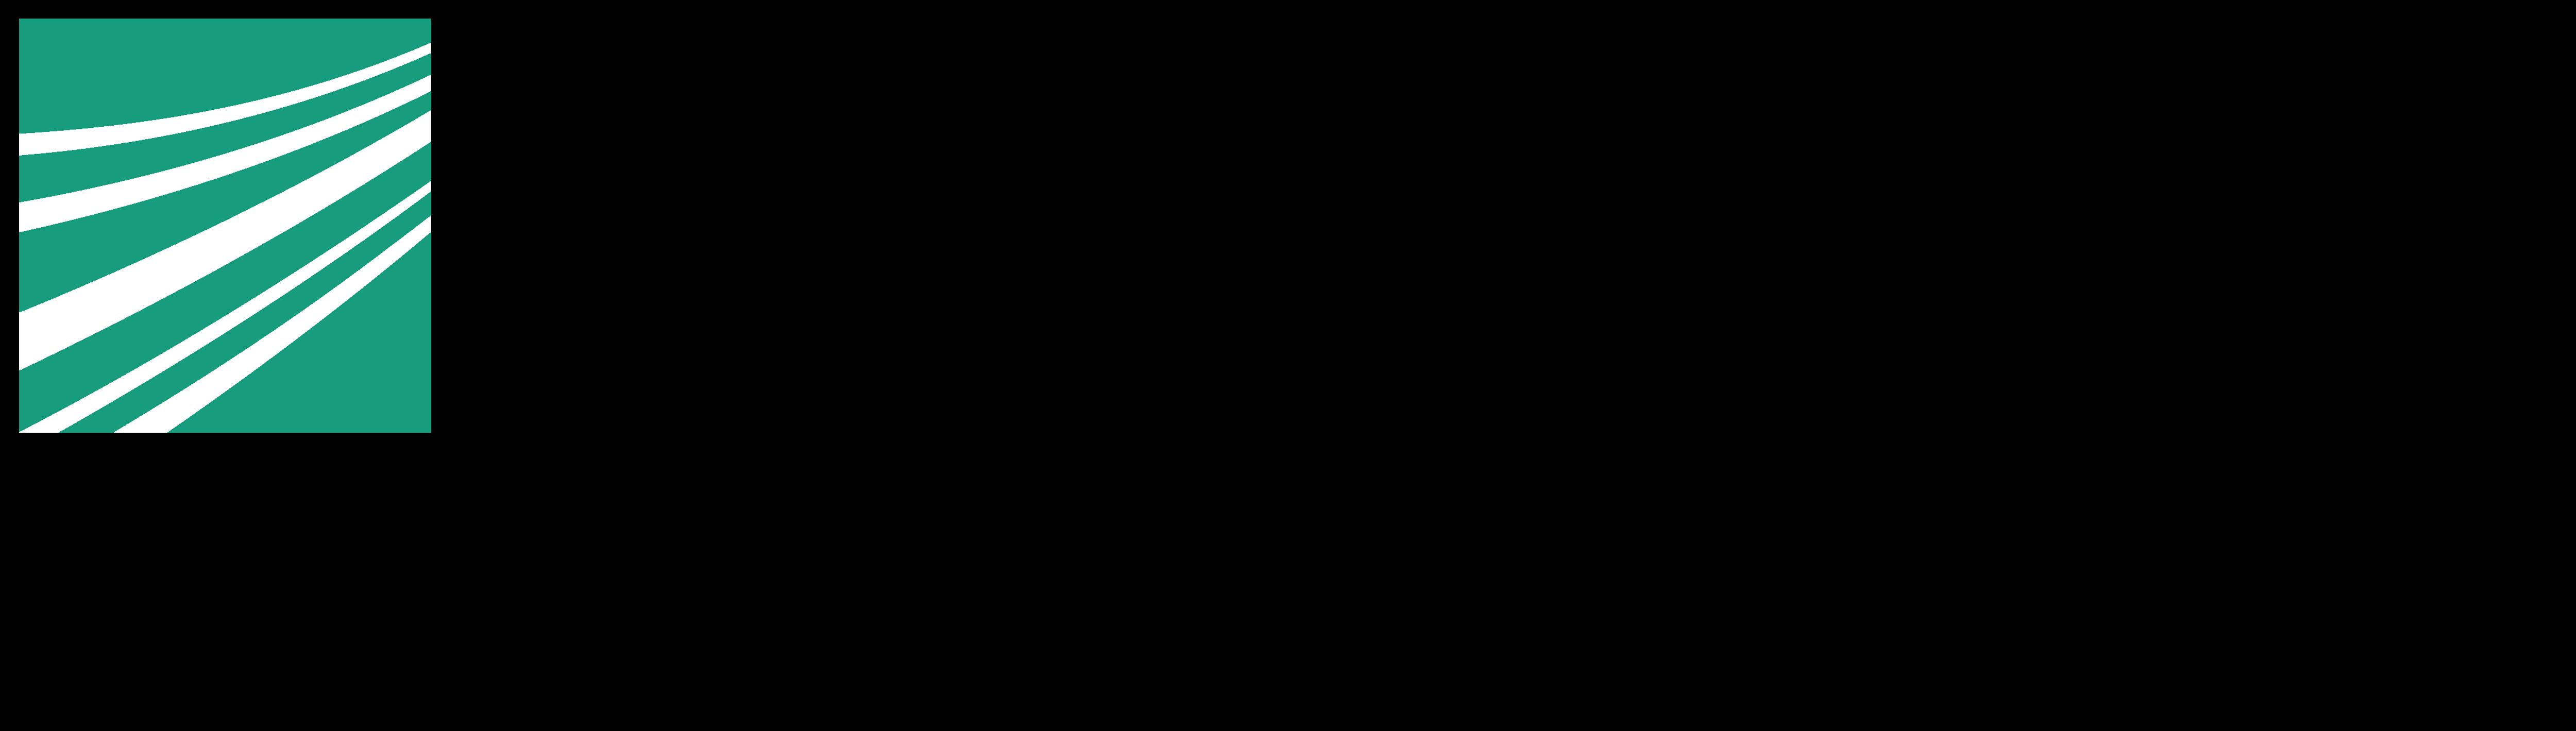 Fraunhofer IISB Logo